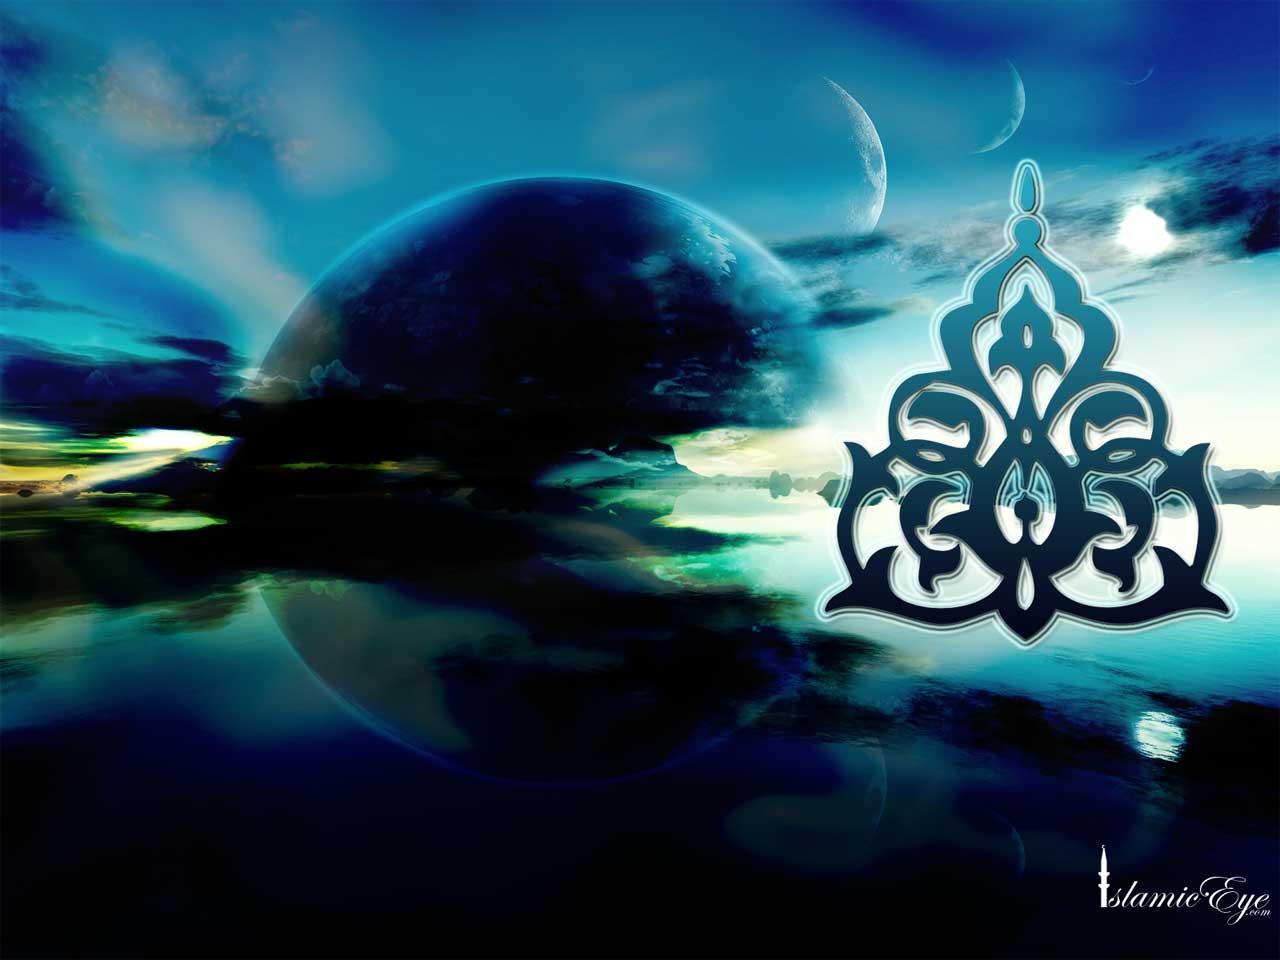 3D Islamic Wallpaper Desktop Wallpapers - WallpaperSafariVery Good 3d Islamic Wallpapers Collection